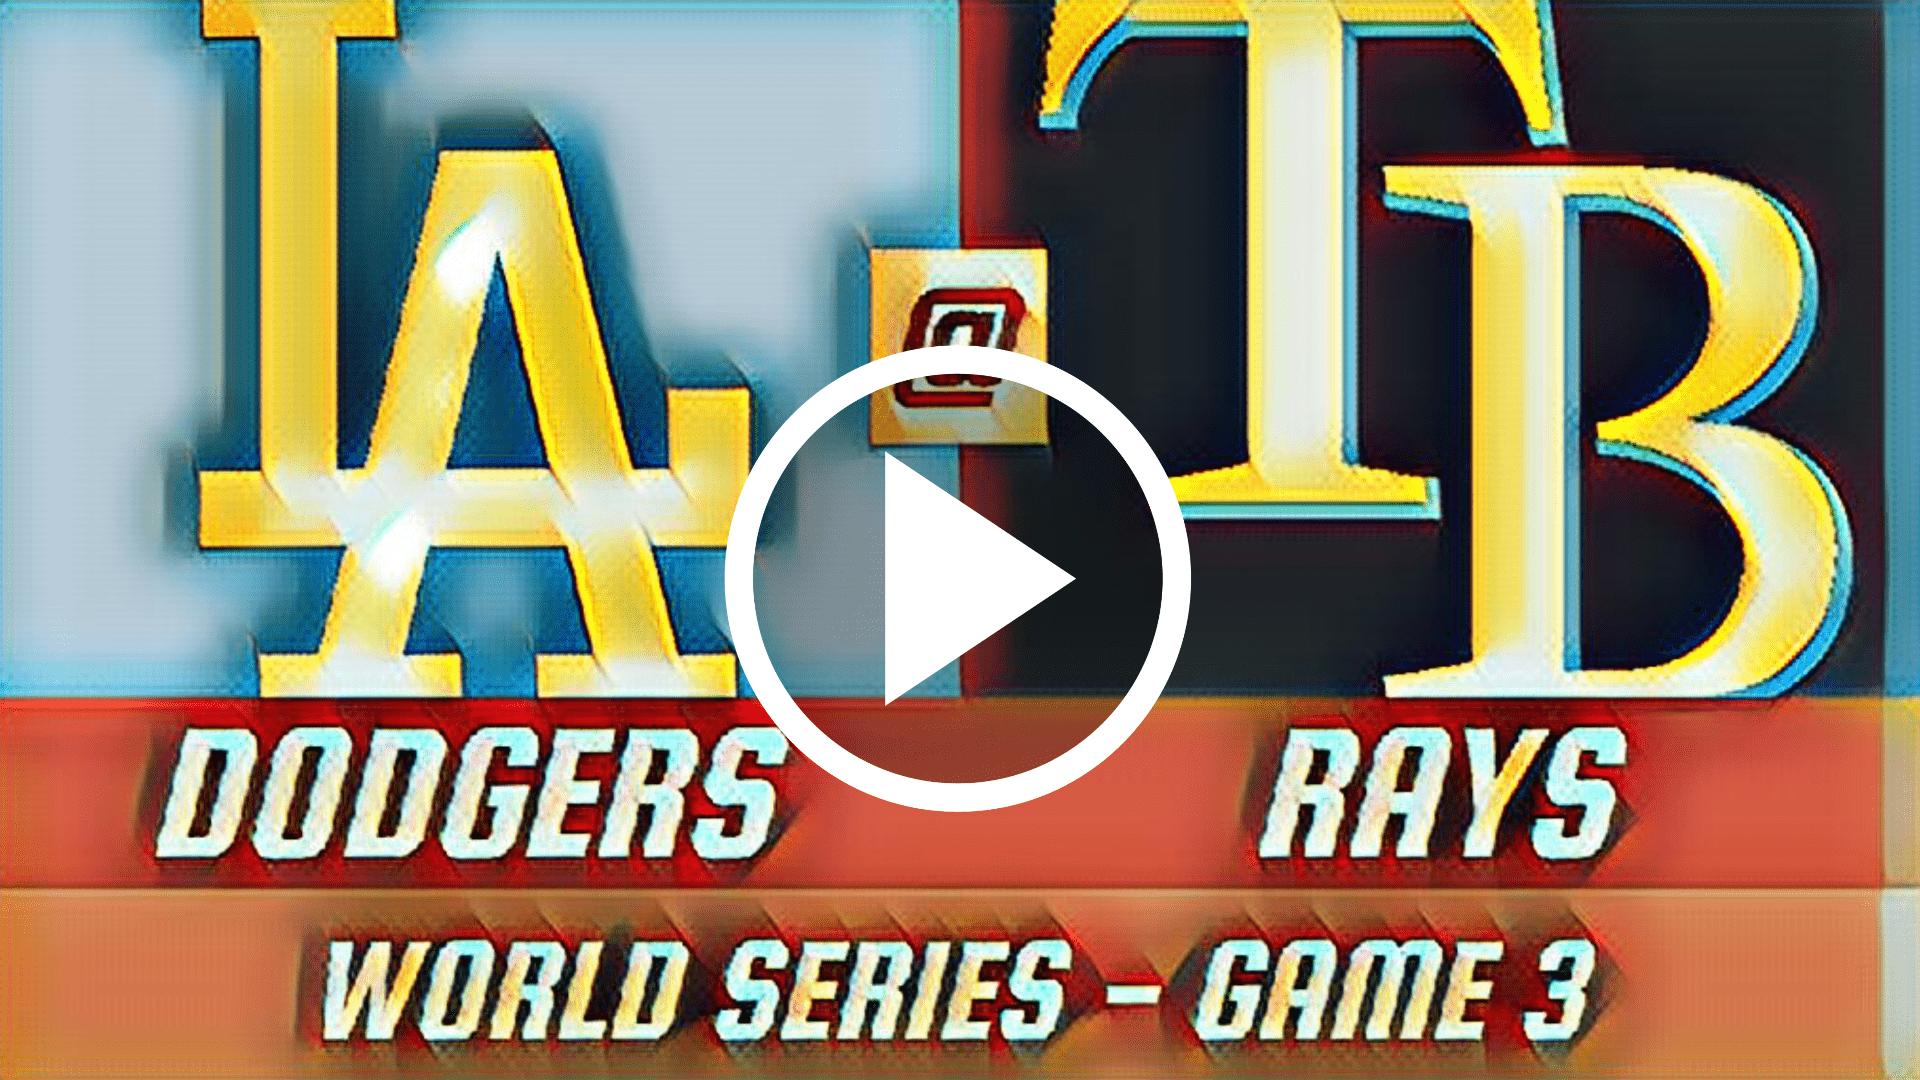 MLB EN VIVO GRATIS ONLINE, Dodgers vs Rays EN VIVO GRATIS ONLINE